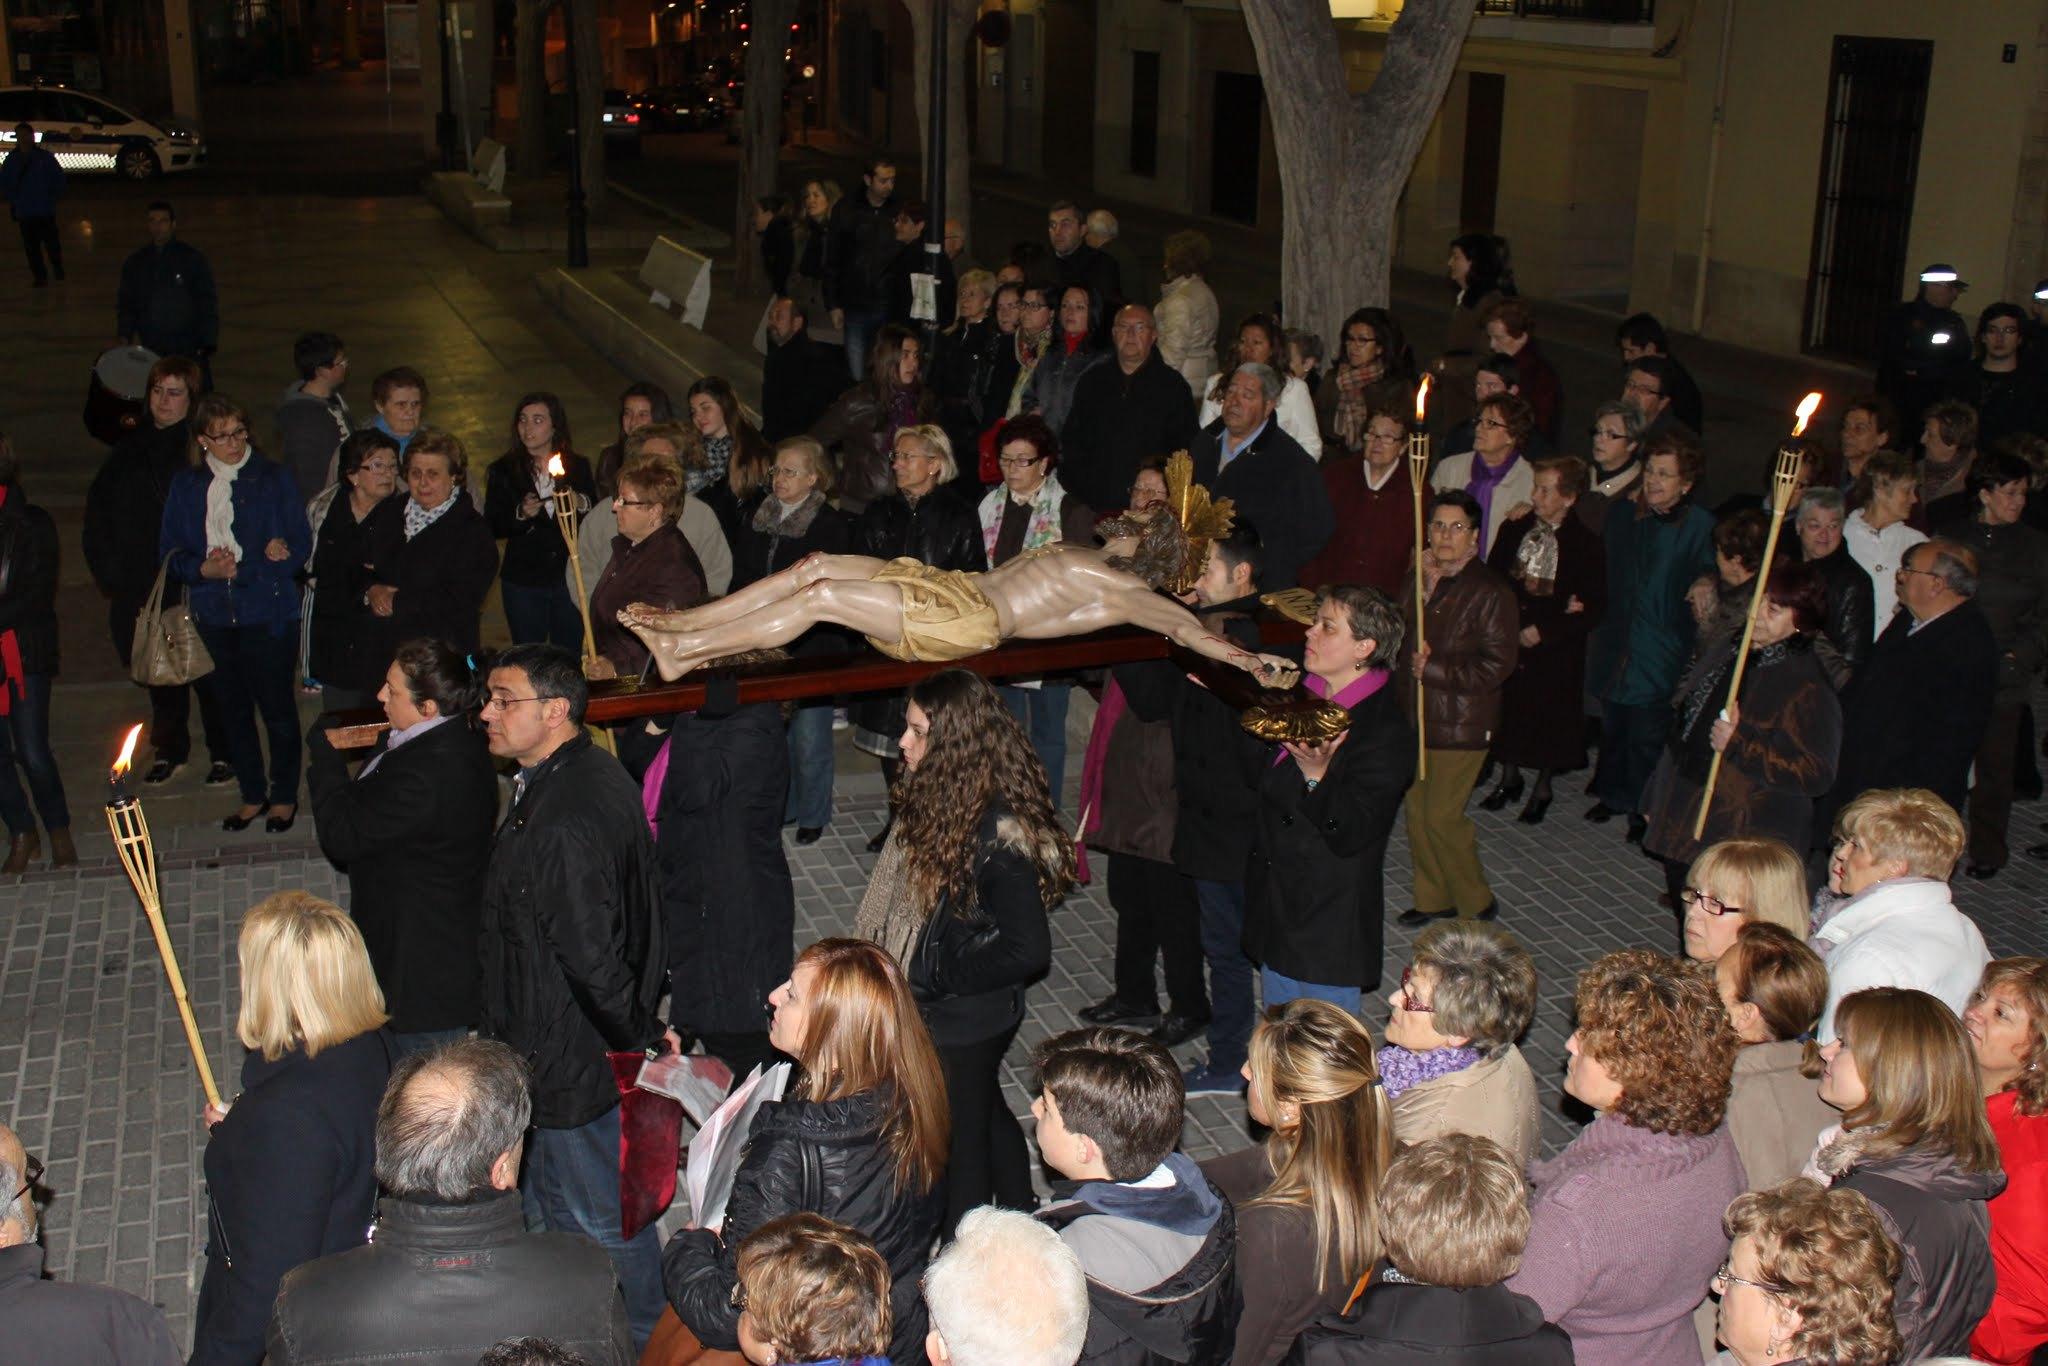 (2013-03-22) - IV Vía Crucis nocturno - Javier Romero Ripoll (106)